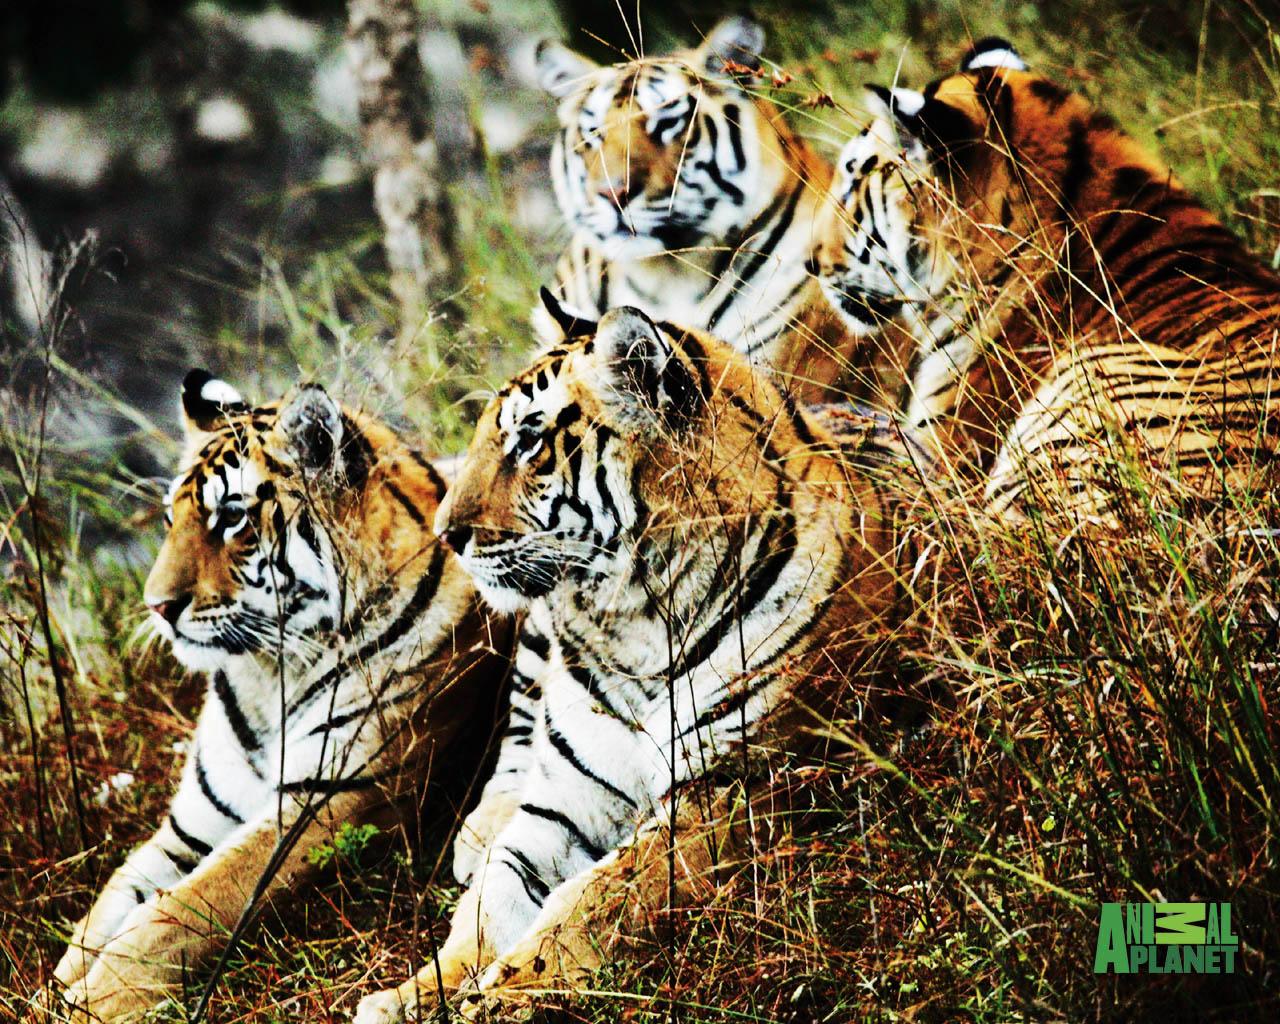 http://3.bp.blogspot.com/_4krEhApfbkY/TRgNJQWkXzI/AAAAAAAAAXc/_rEU3Ag4Jqc/s1600/tiger-spy-2-1280.jpg